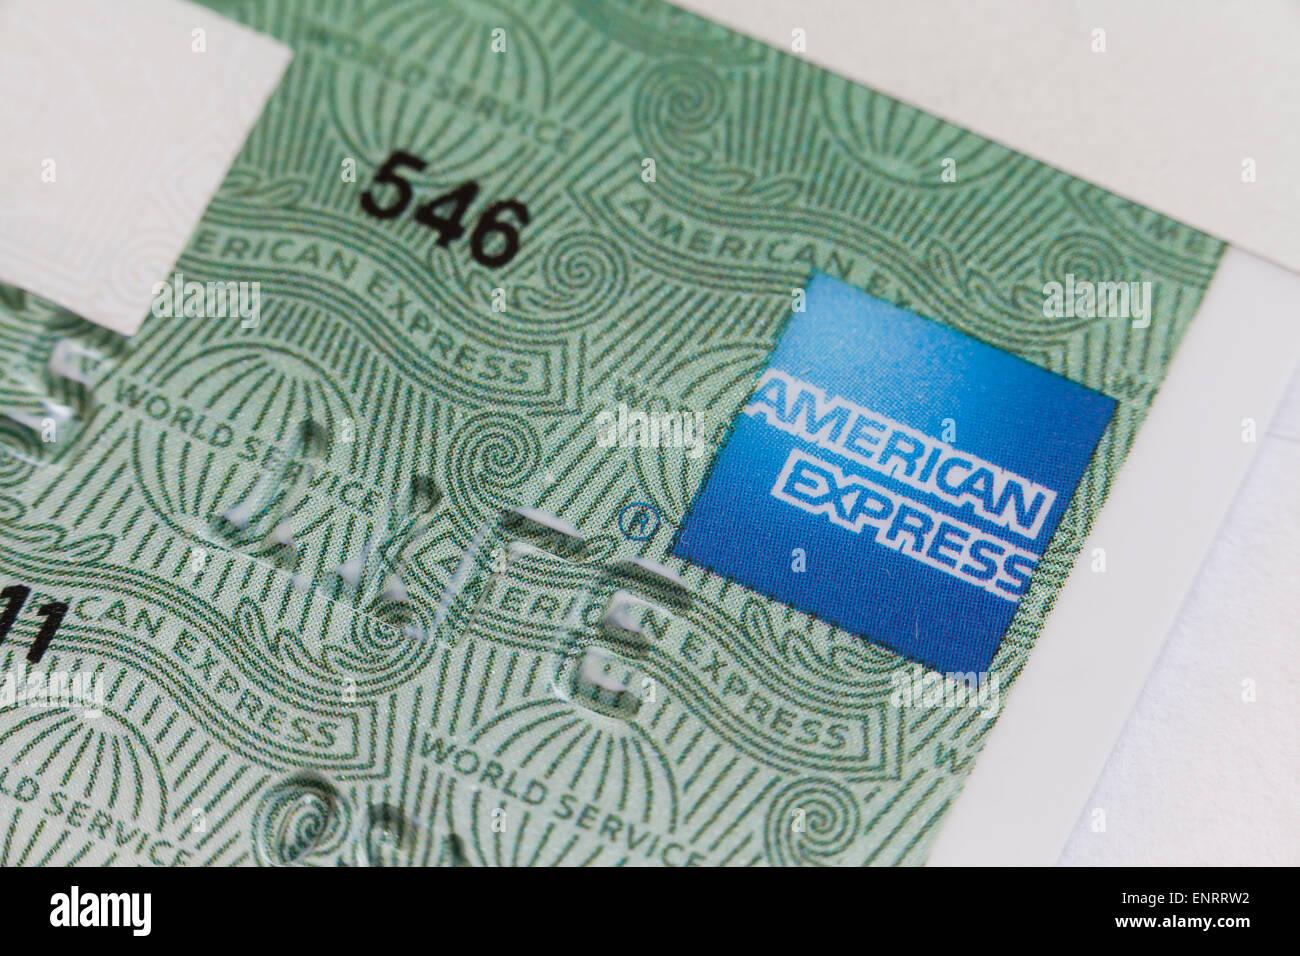 American Express Karte Closeup - USA Stockbild